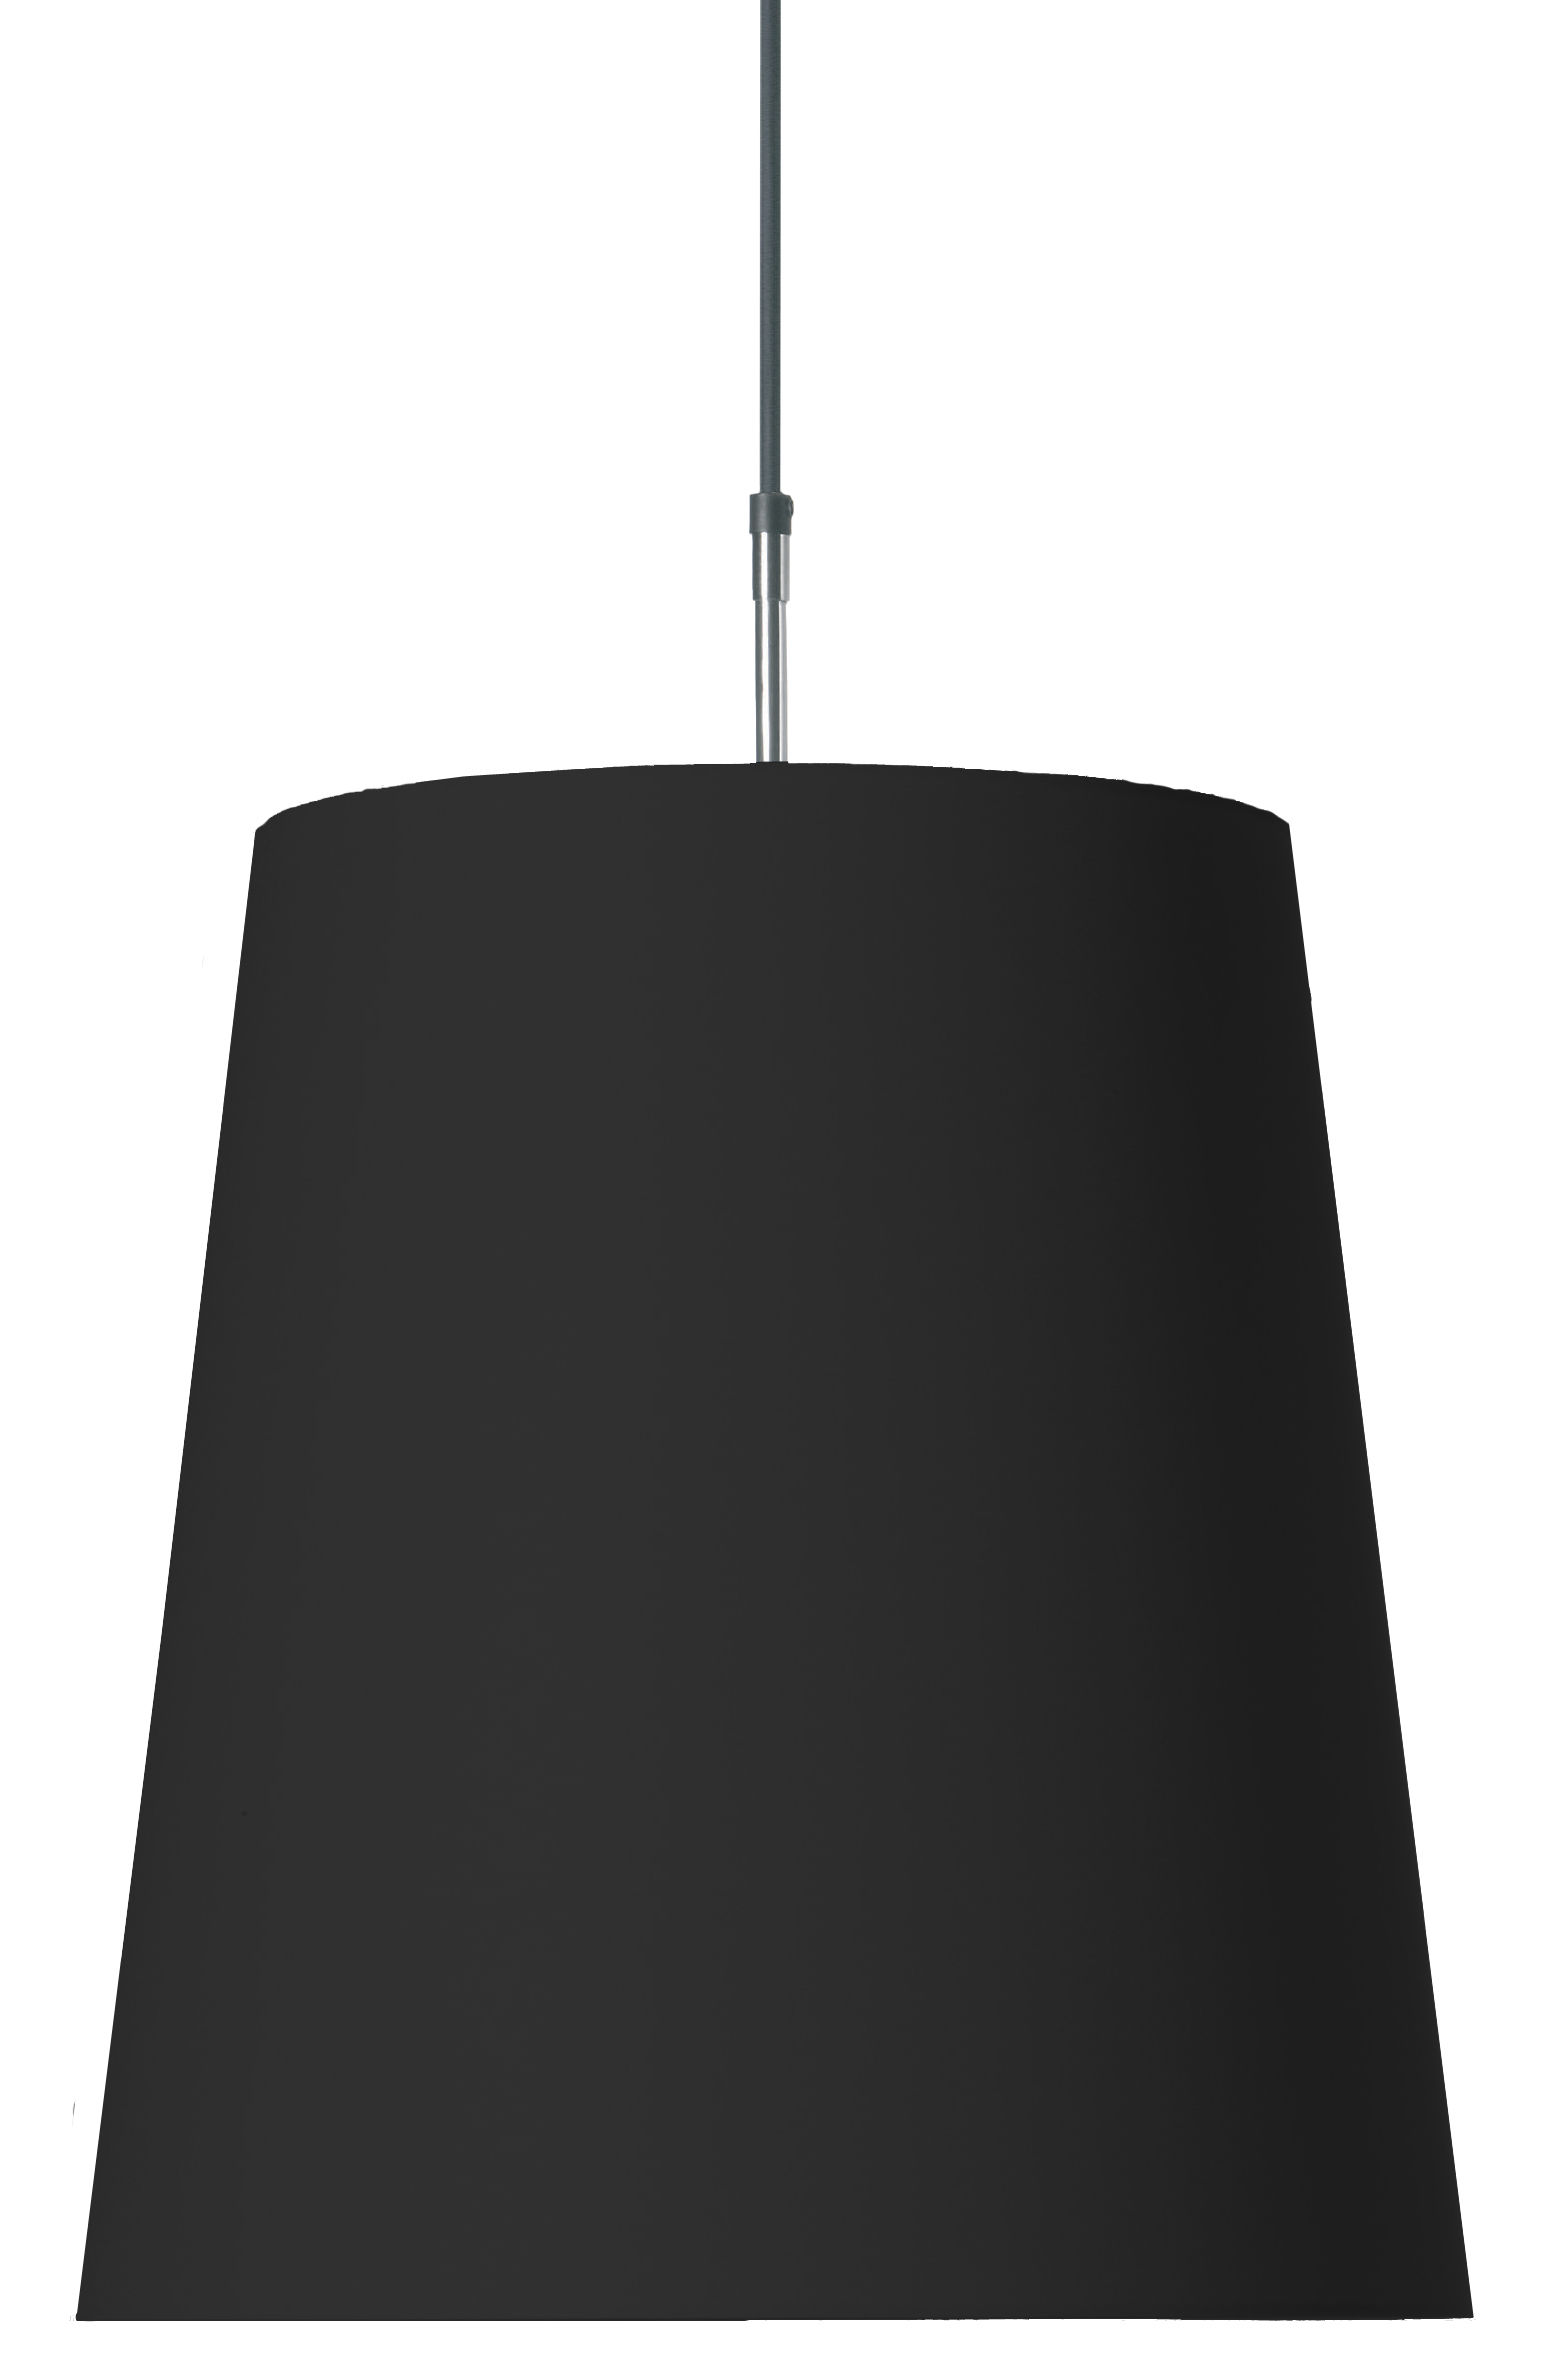 Illuminazione - Lampadari - Sospensione Round Light di Moooi - Noir - Cotone